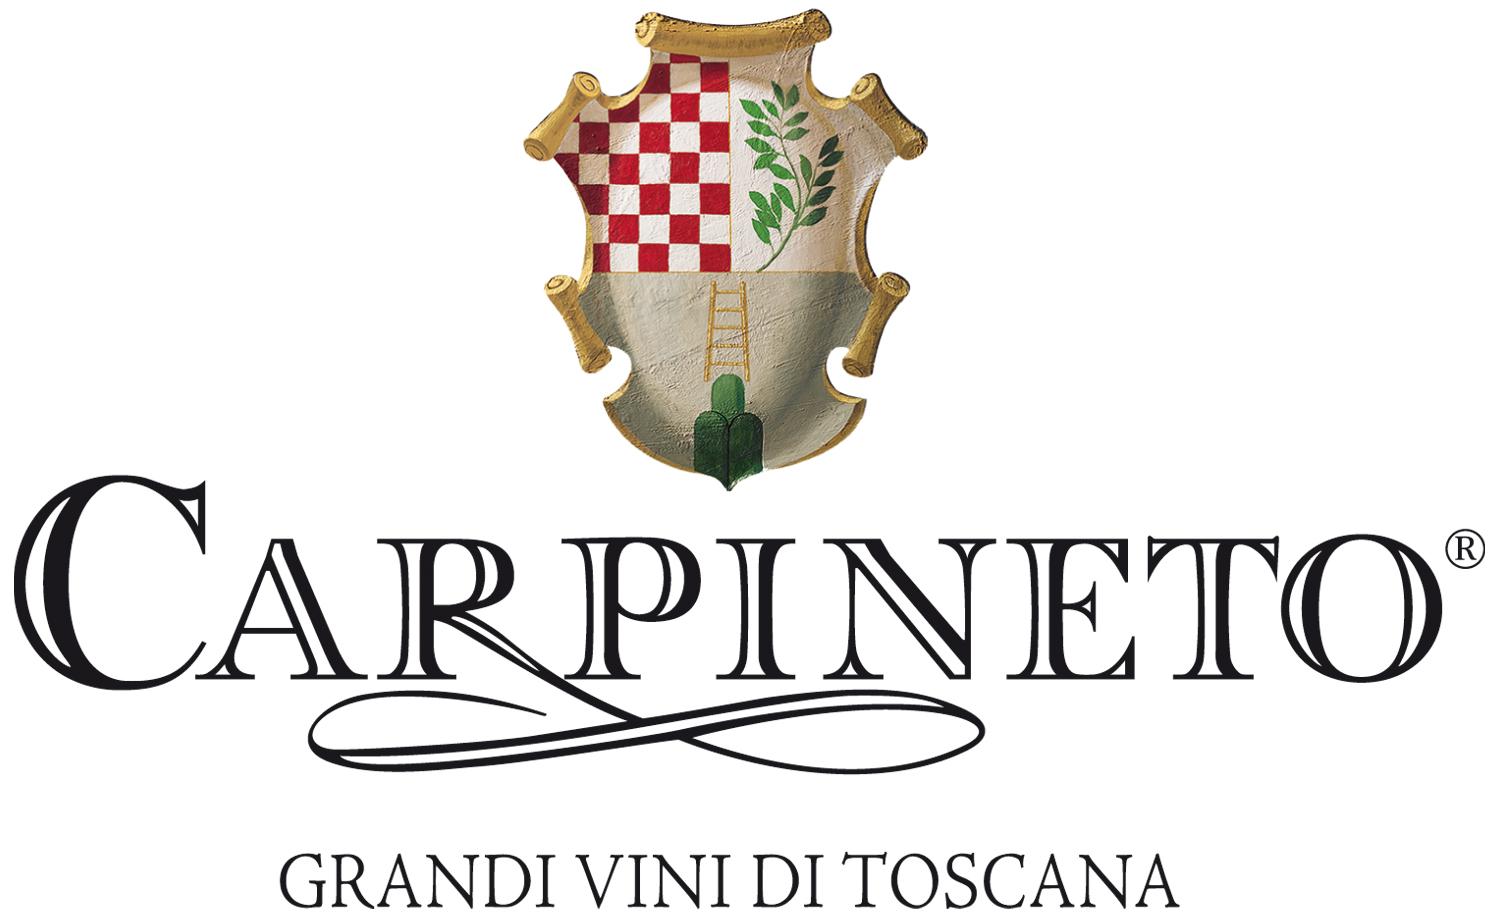 carpineto_logo_hi_res.jpg